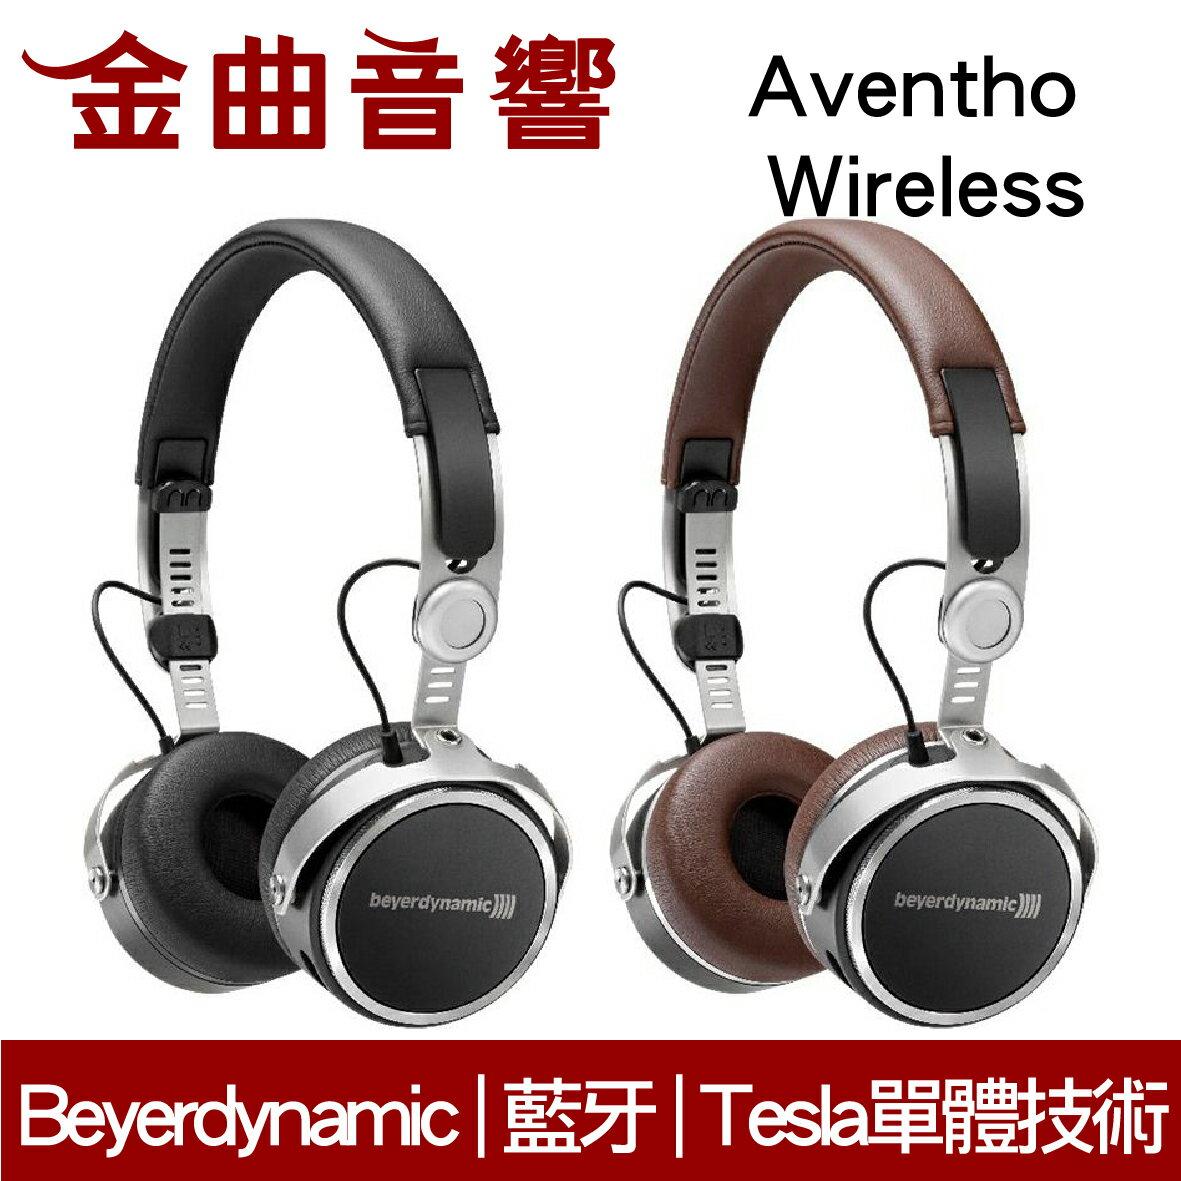 Beyerdynamic 拜耳 Aventho Wireless 兩色可選 無線 藍牙 耳罩式耳機 | 金曲音響